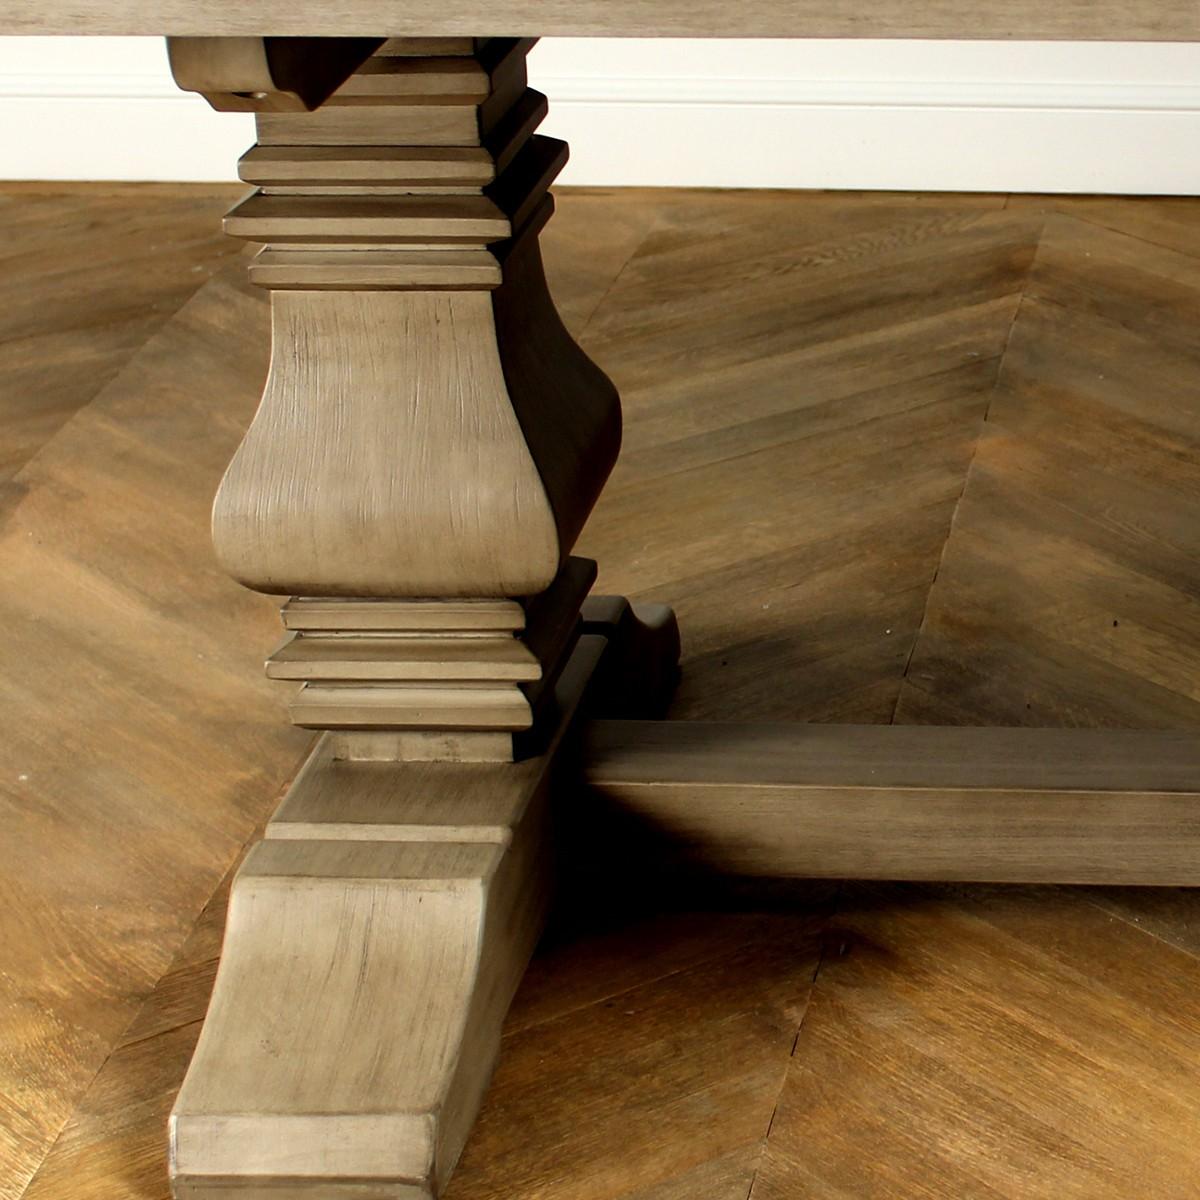 table de salle manger rallonges penelope 10 14 couverts. Black Bedroom Furniture Sets. Home Design Ideas